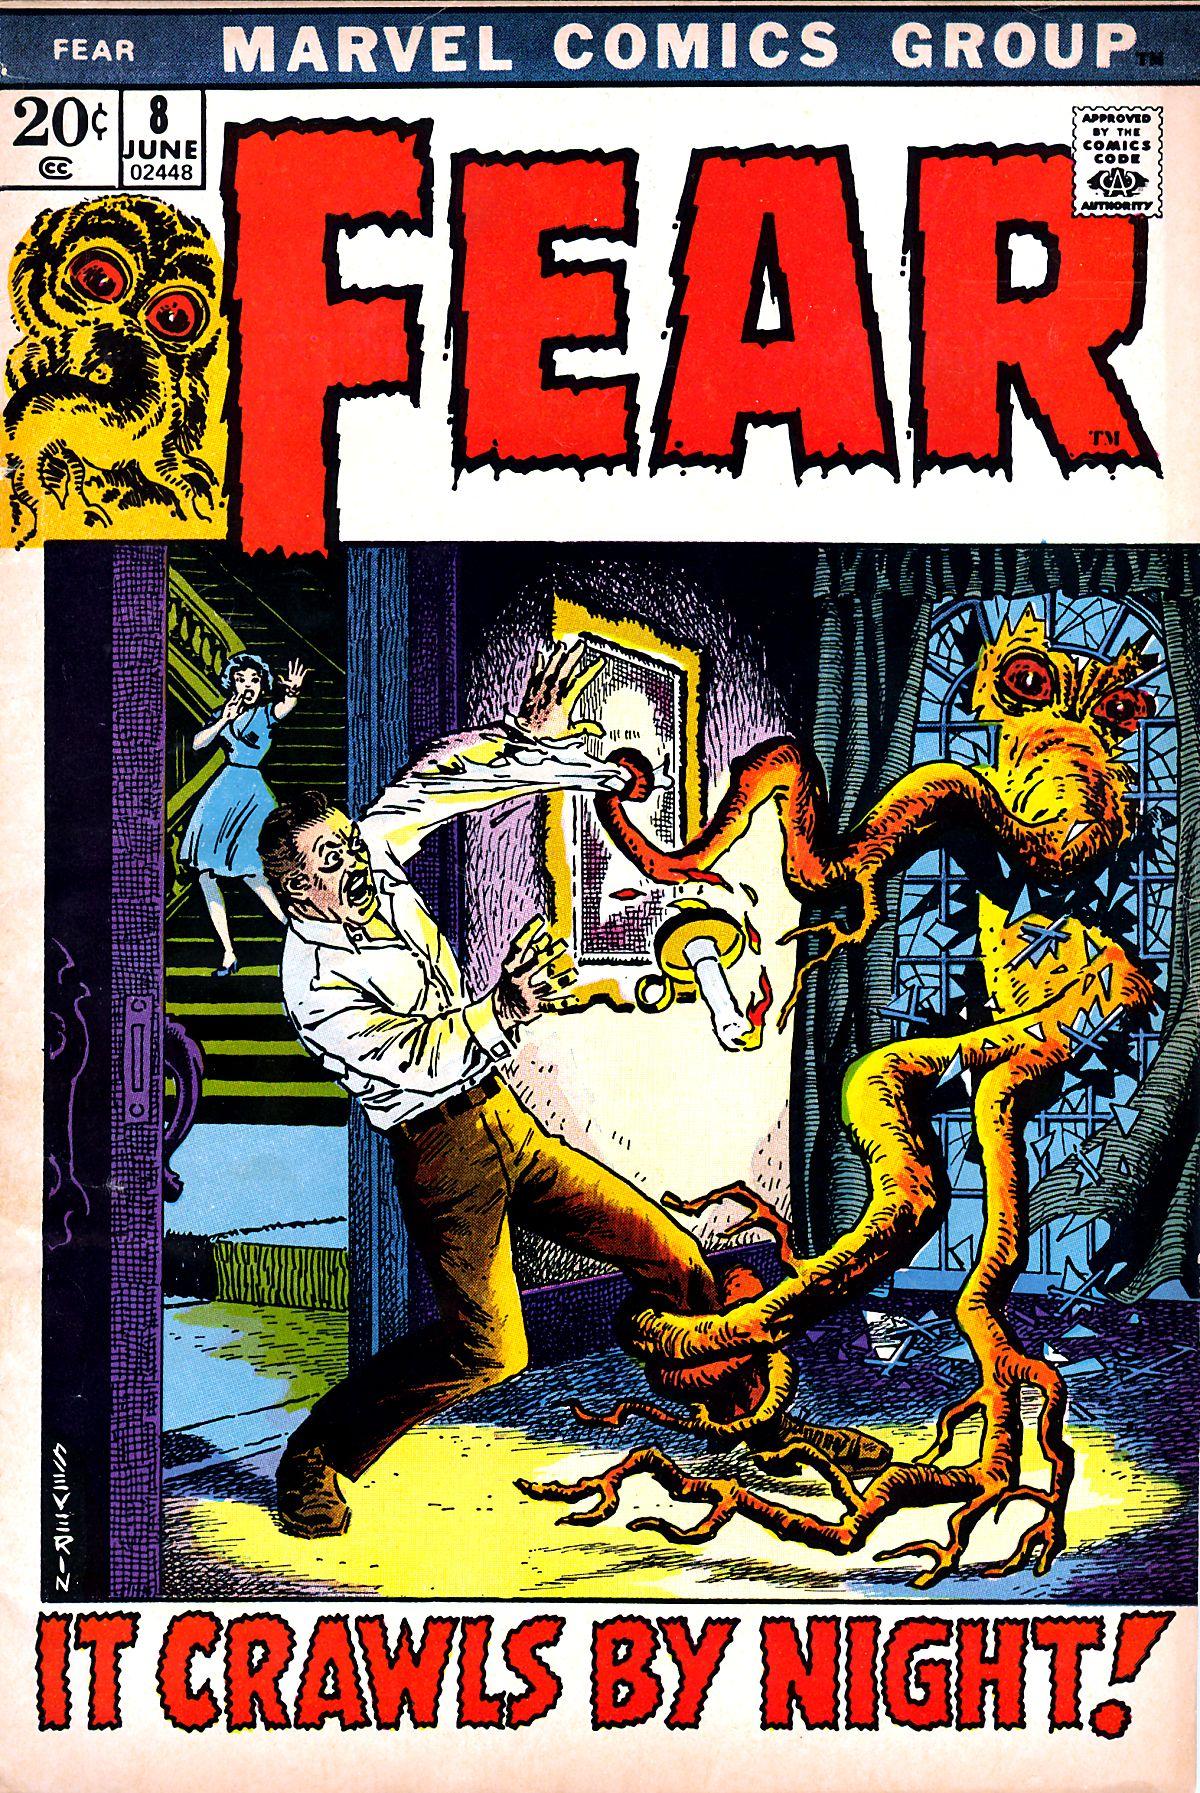 Fear (1970) #8, cover by John Severin.